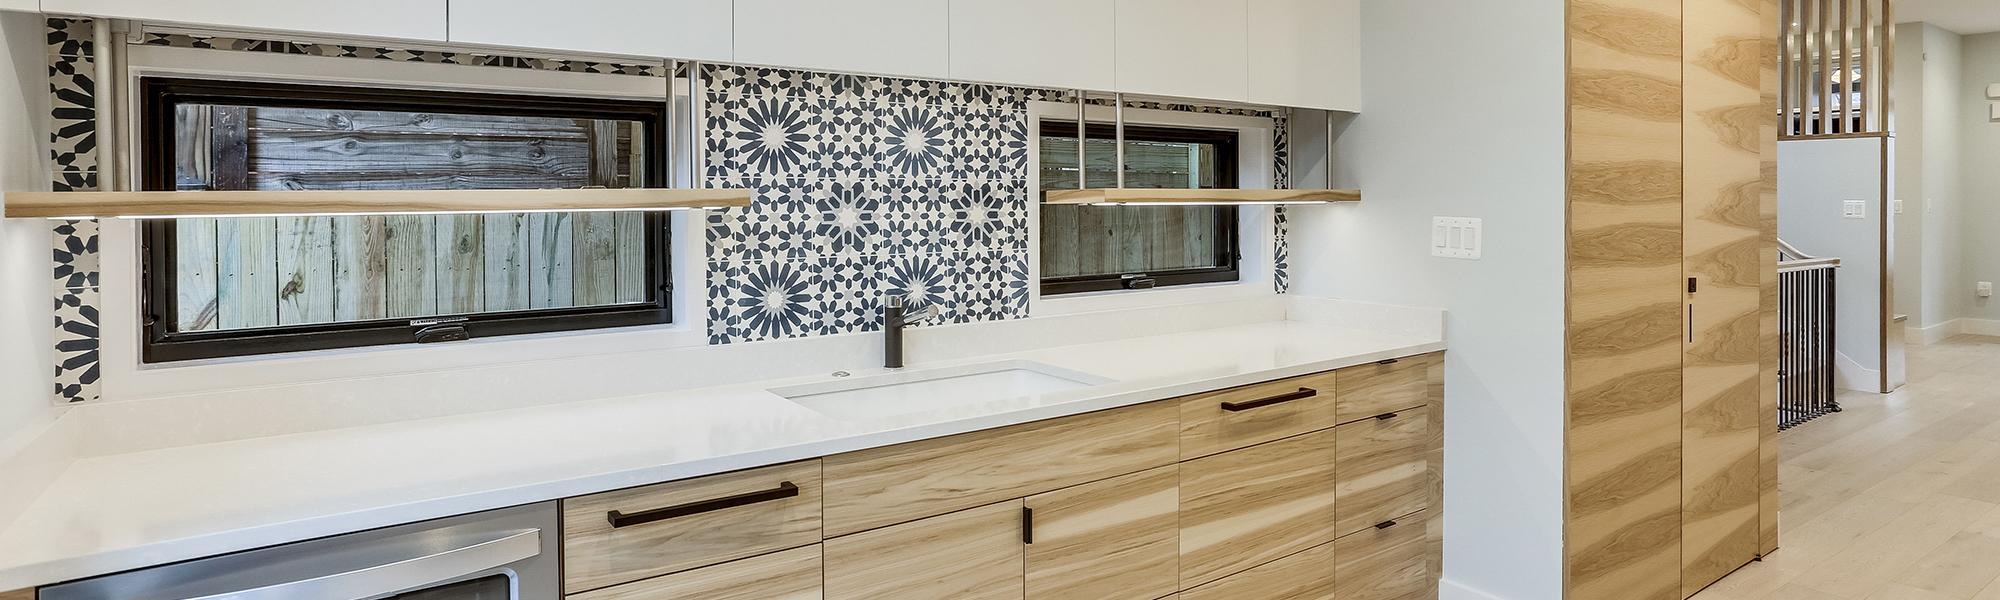 Washington DC Kitchen Renovation